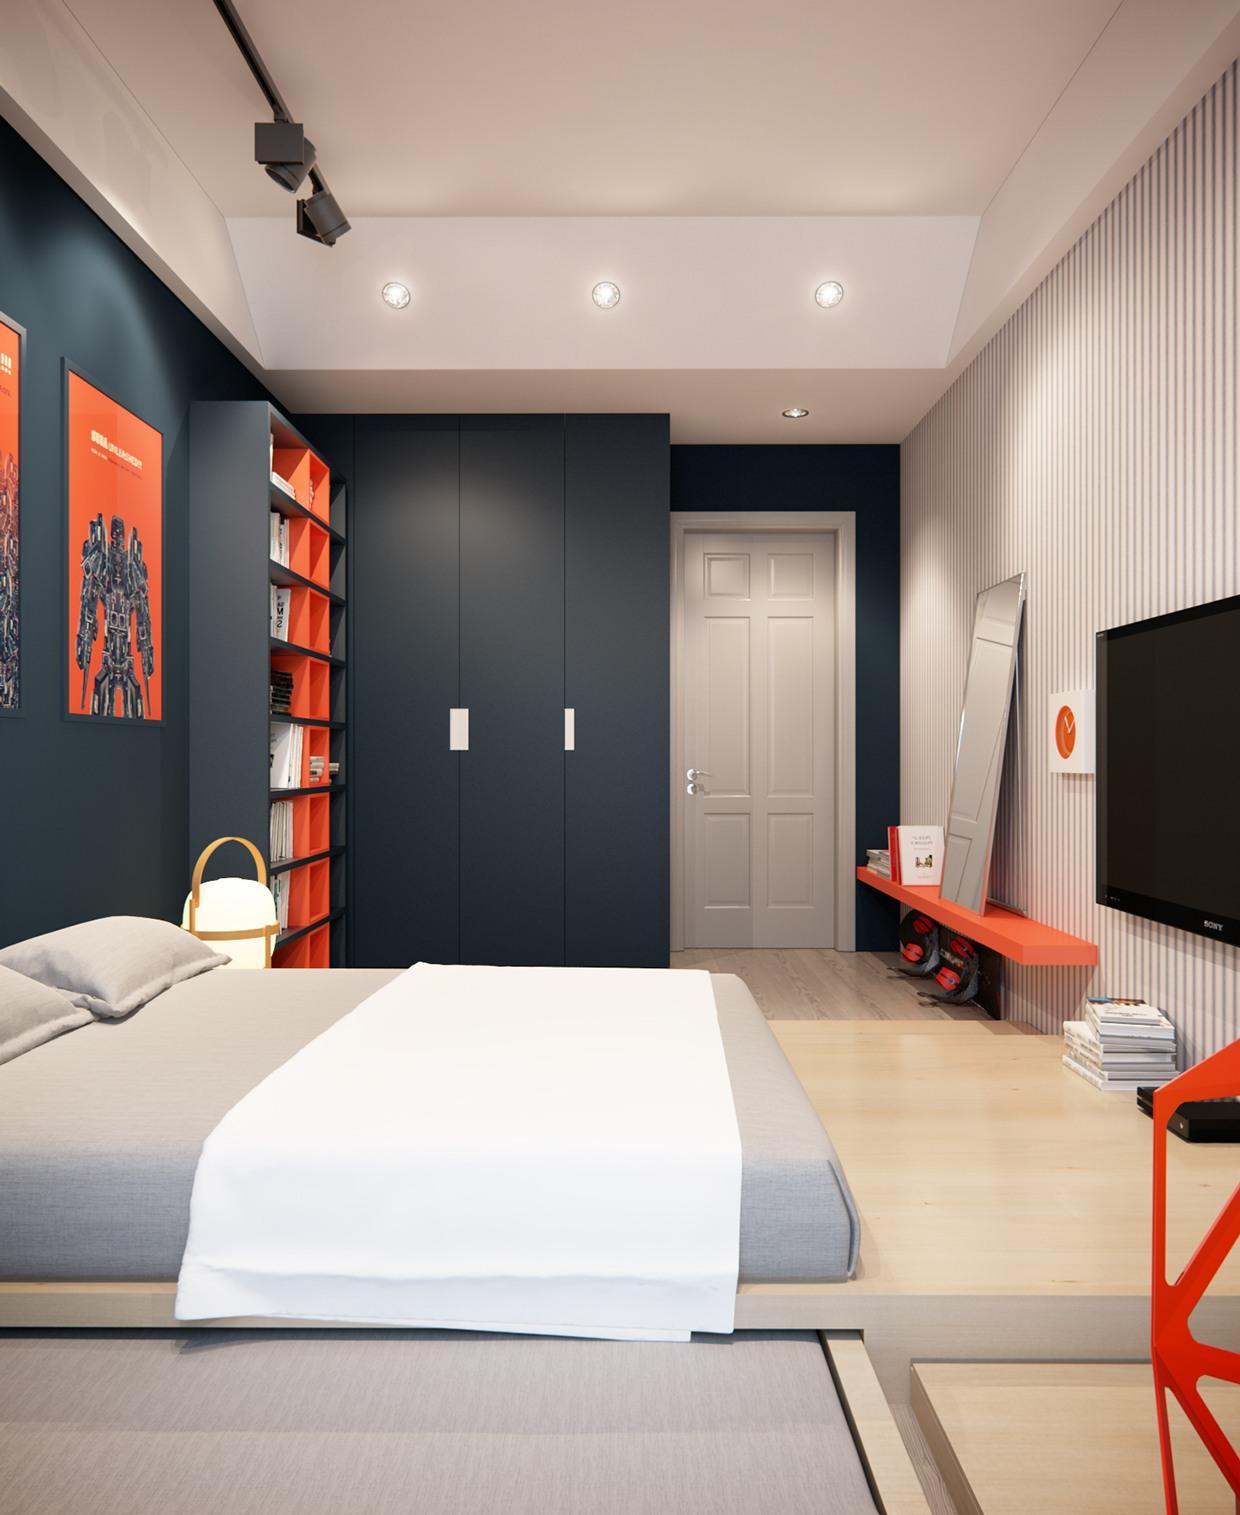 boysbedroomdesign  Interior Design Ideas